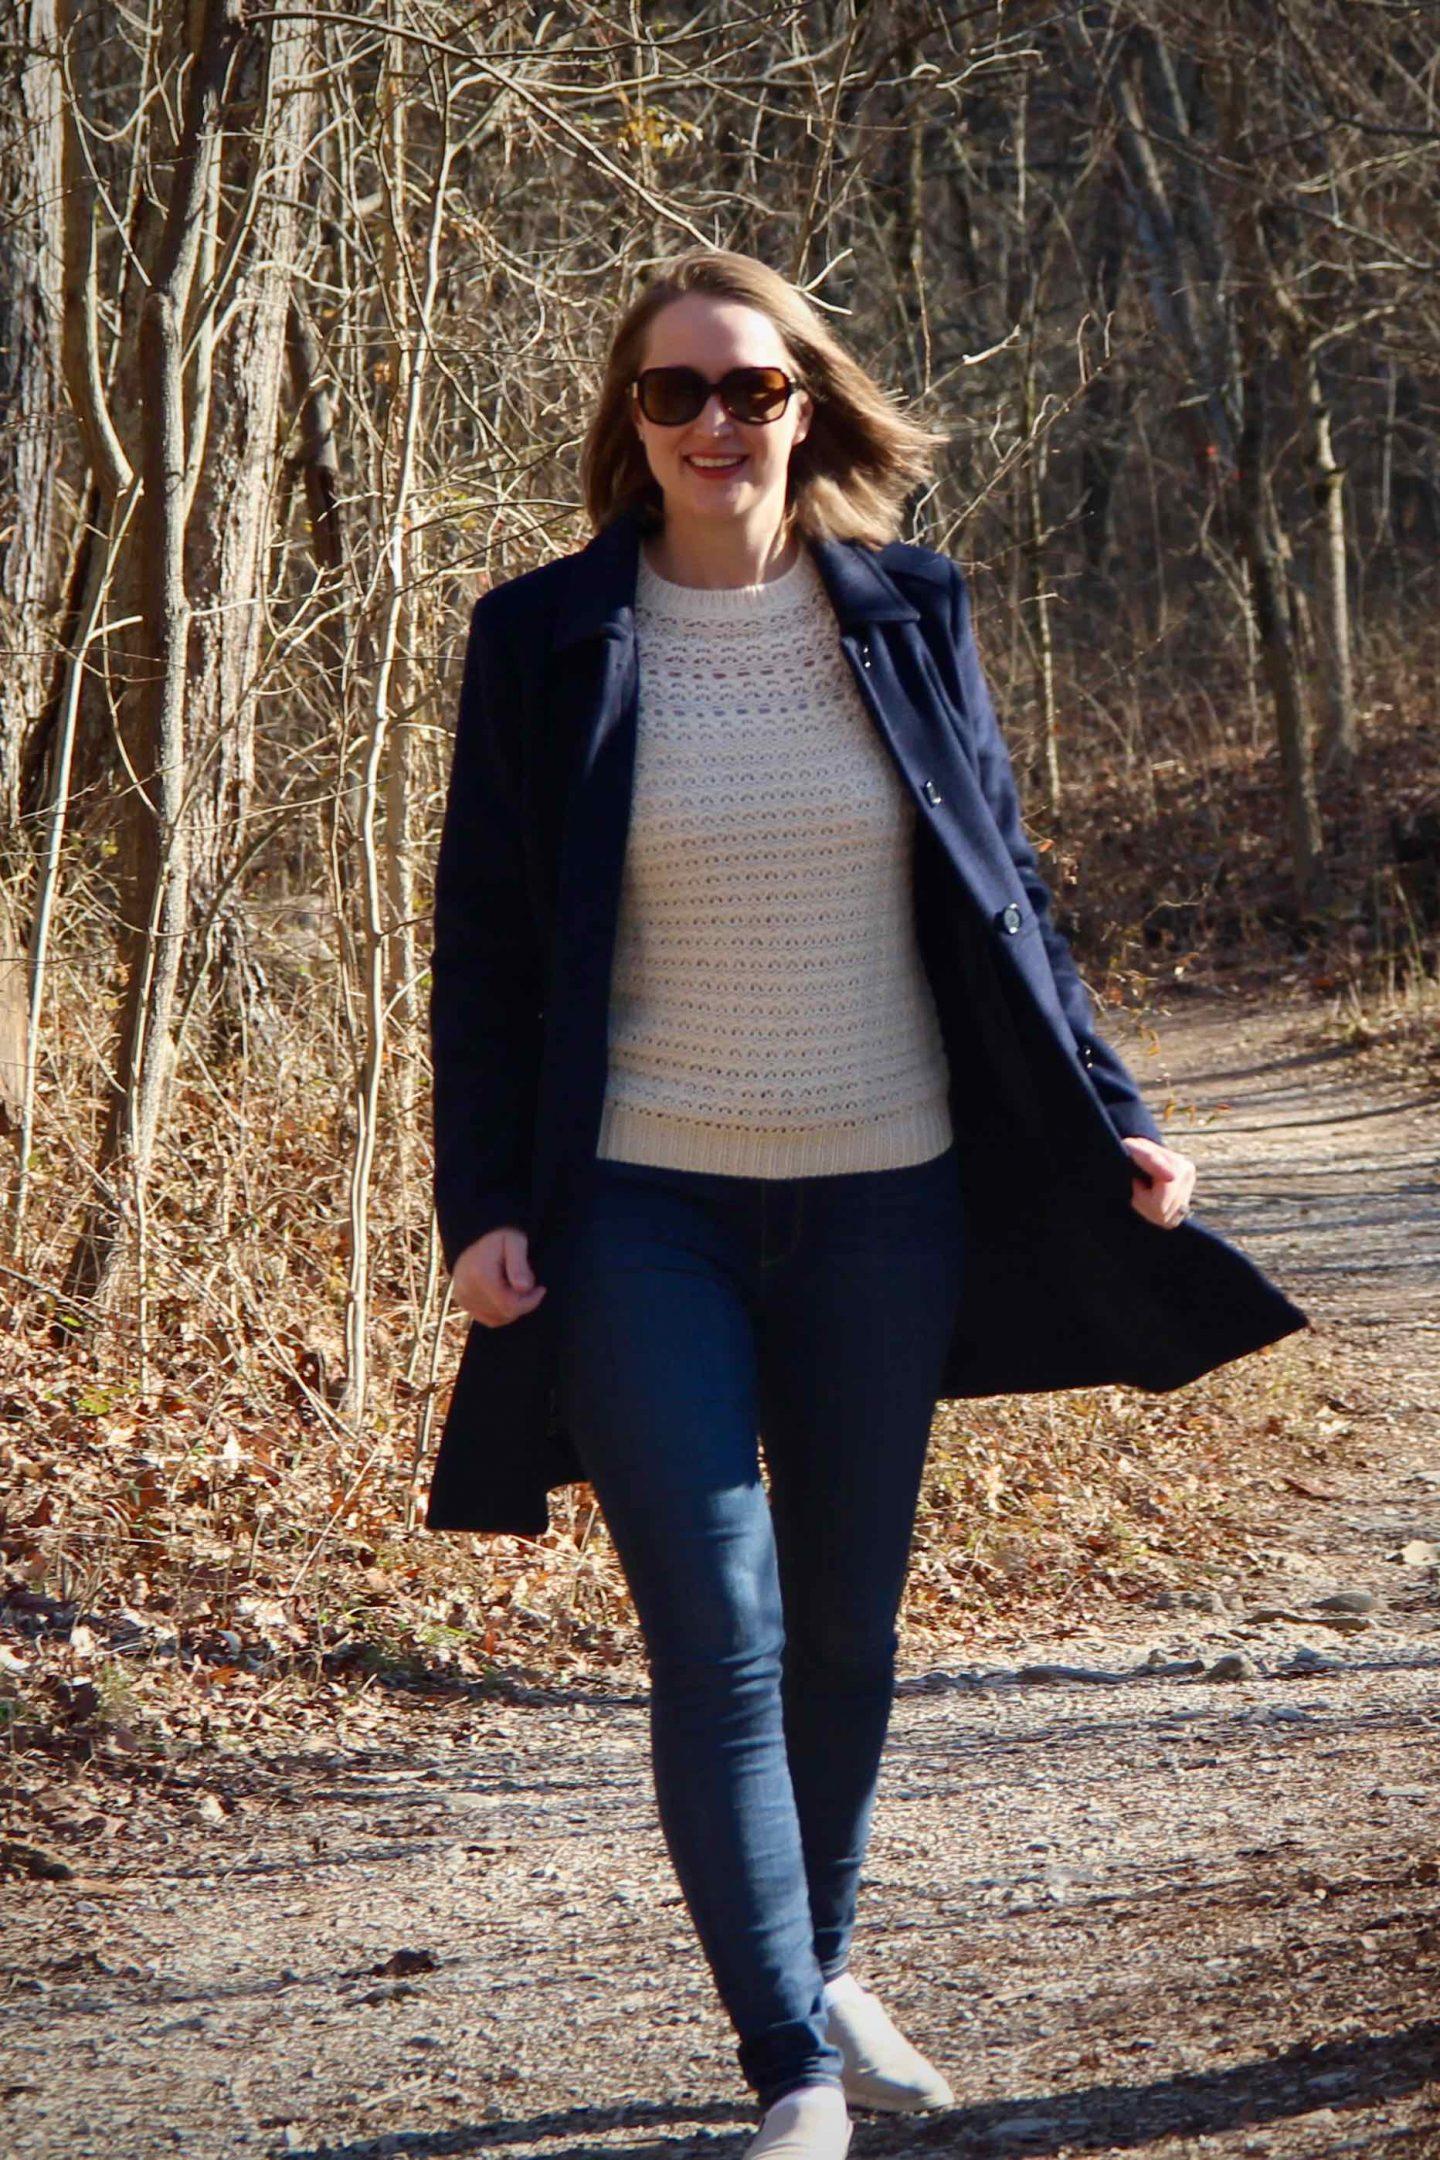 Preppy Winter Outfit Ideas | Walks through Sharon Woods | The Spectacular Adventurer